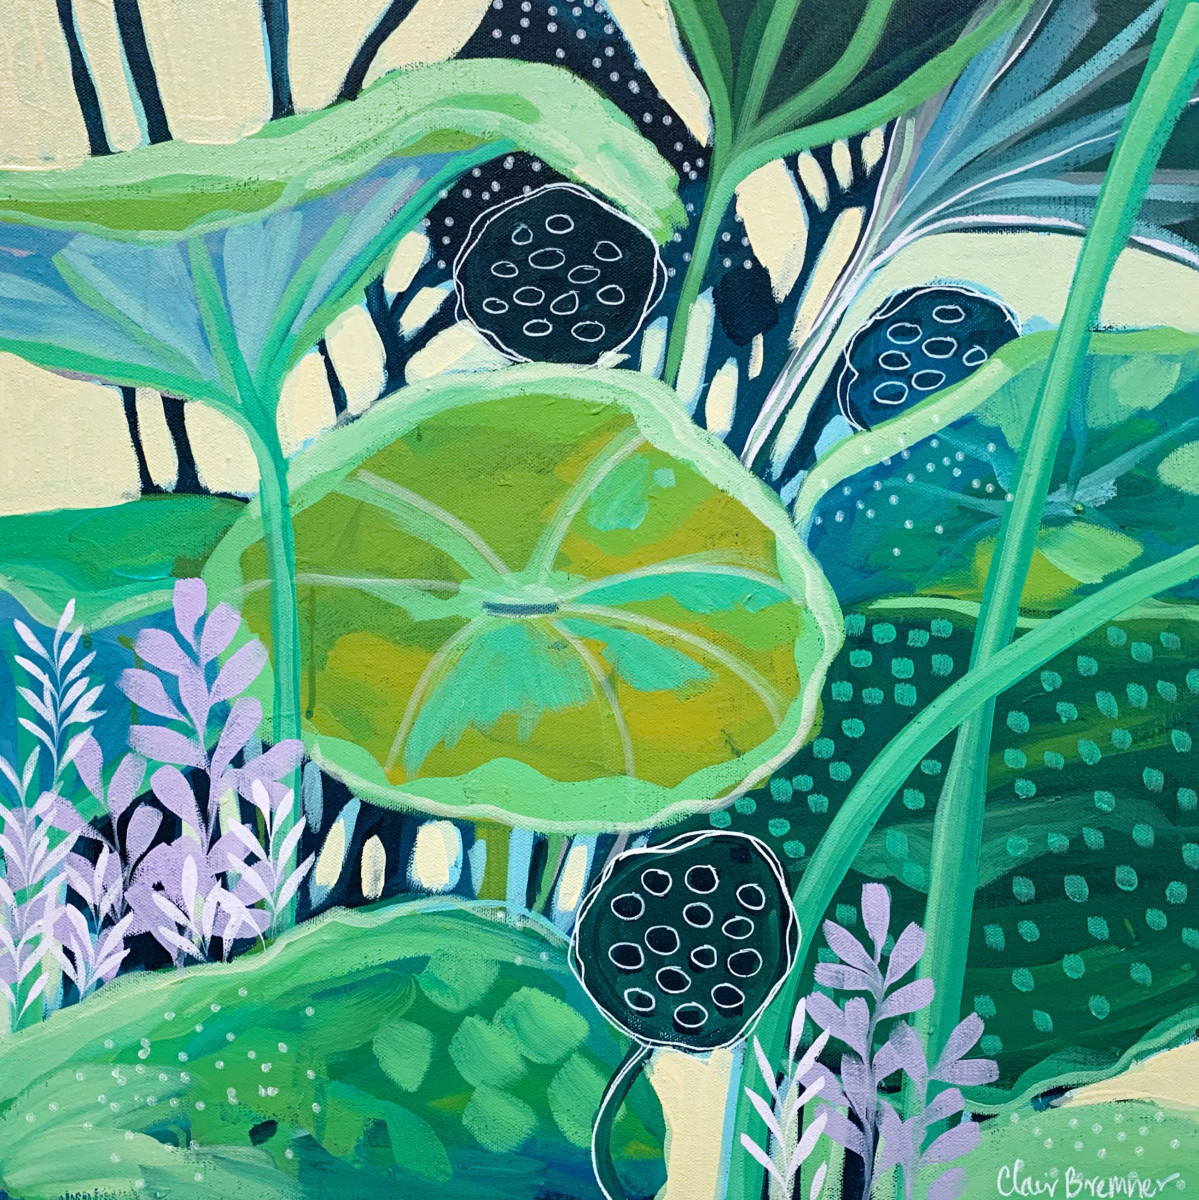 Seeking Light by Clair Bremner